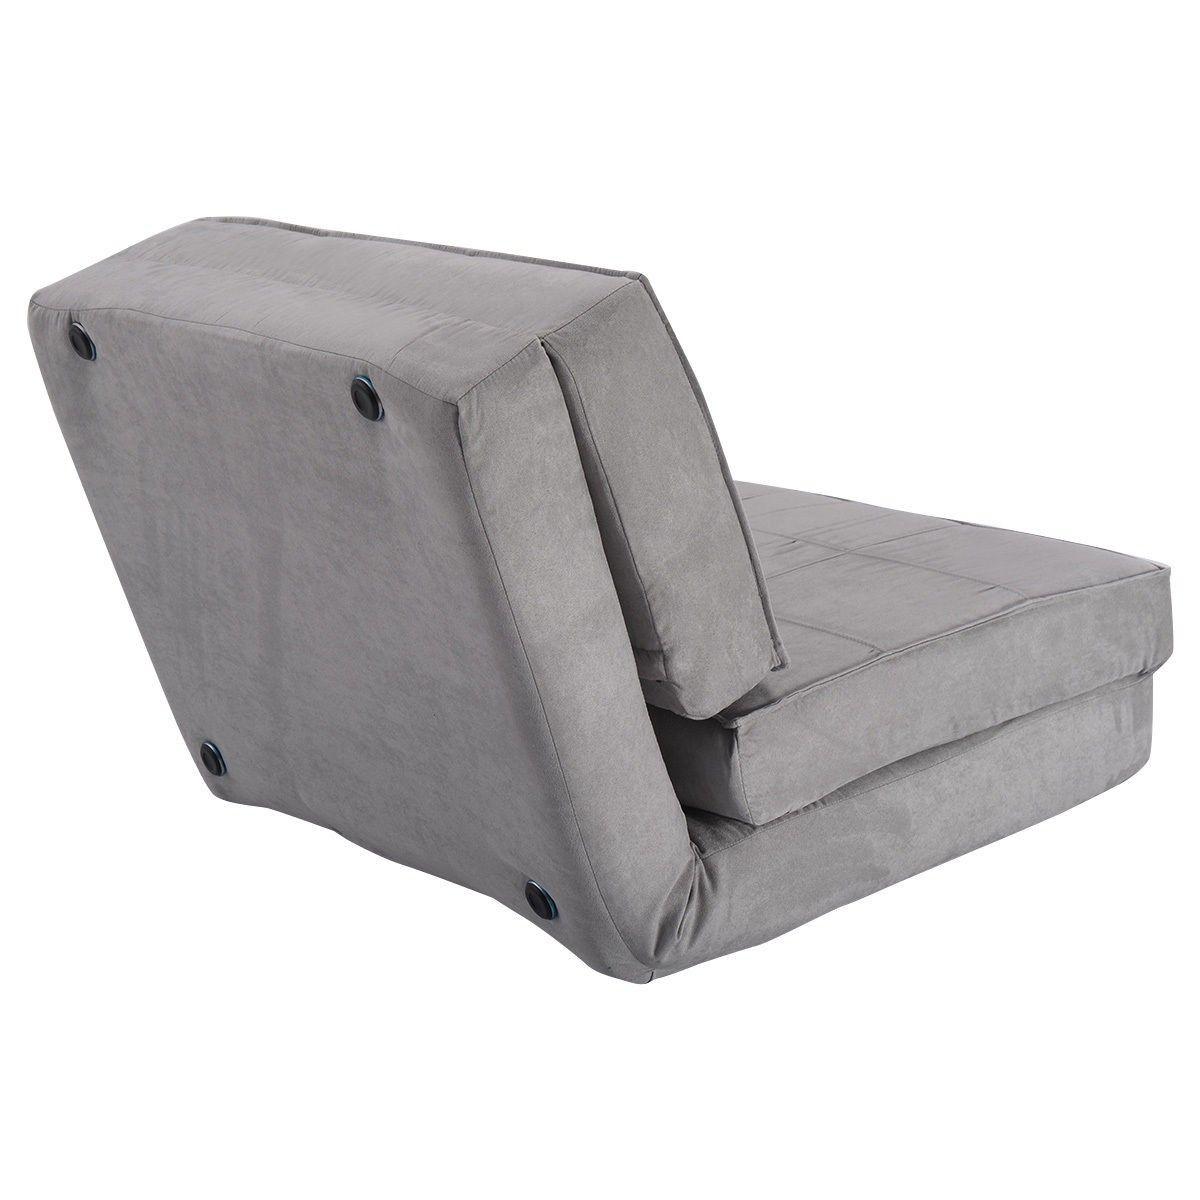 Surprising Convertible Lounger Folding Sofa Sleeper Bed Chairs Theyellowbook Wood Chair Design Ideas Theyellowbookinfo